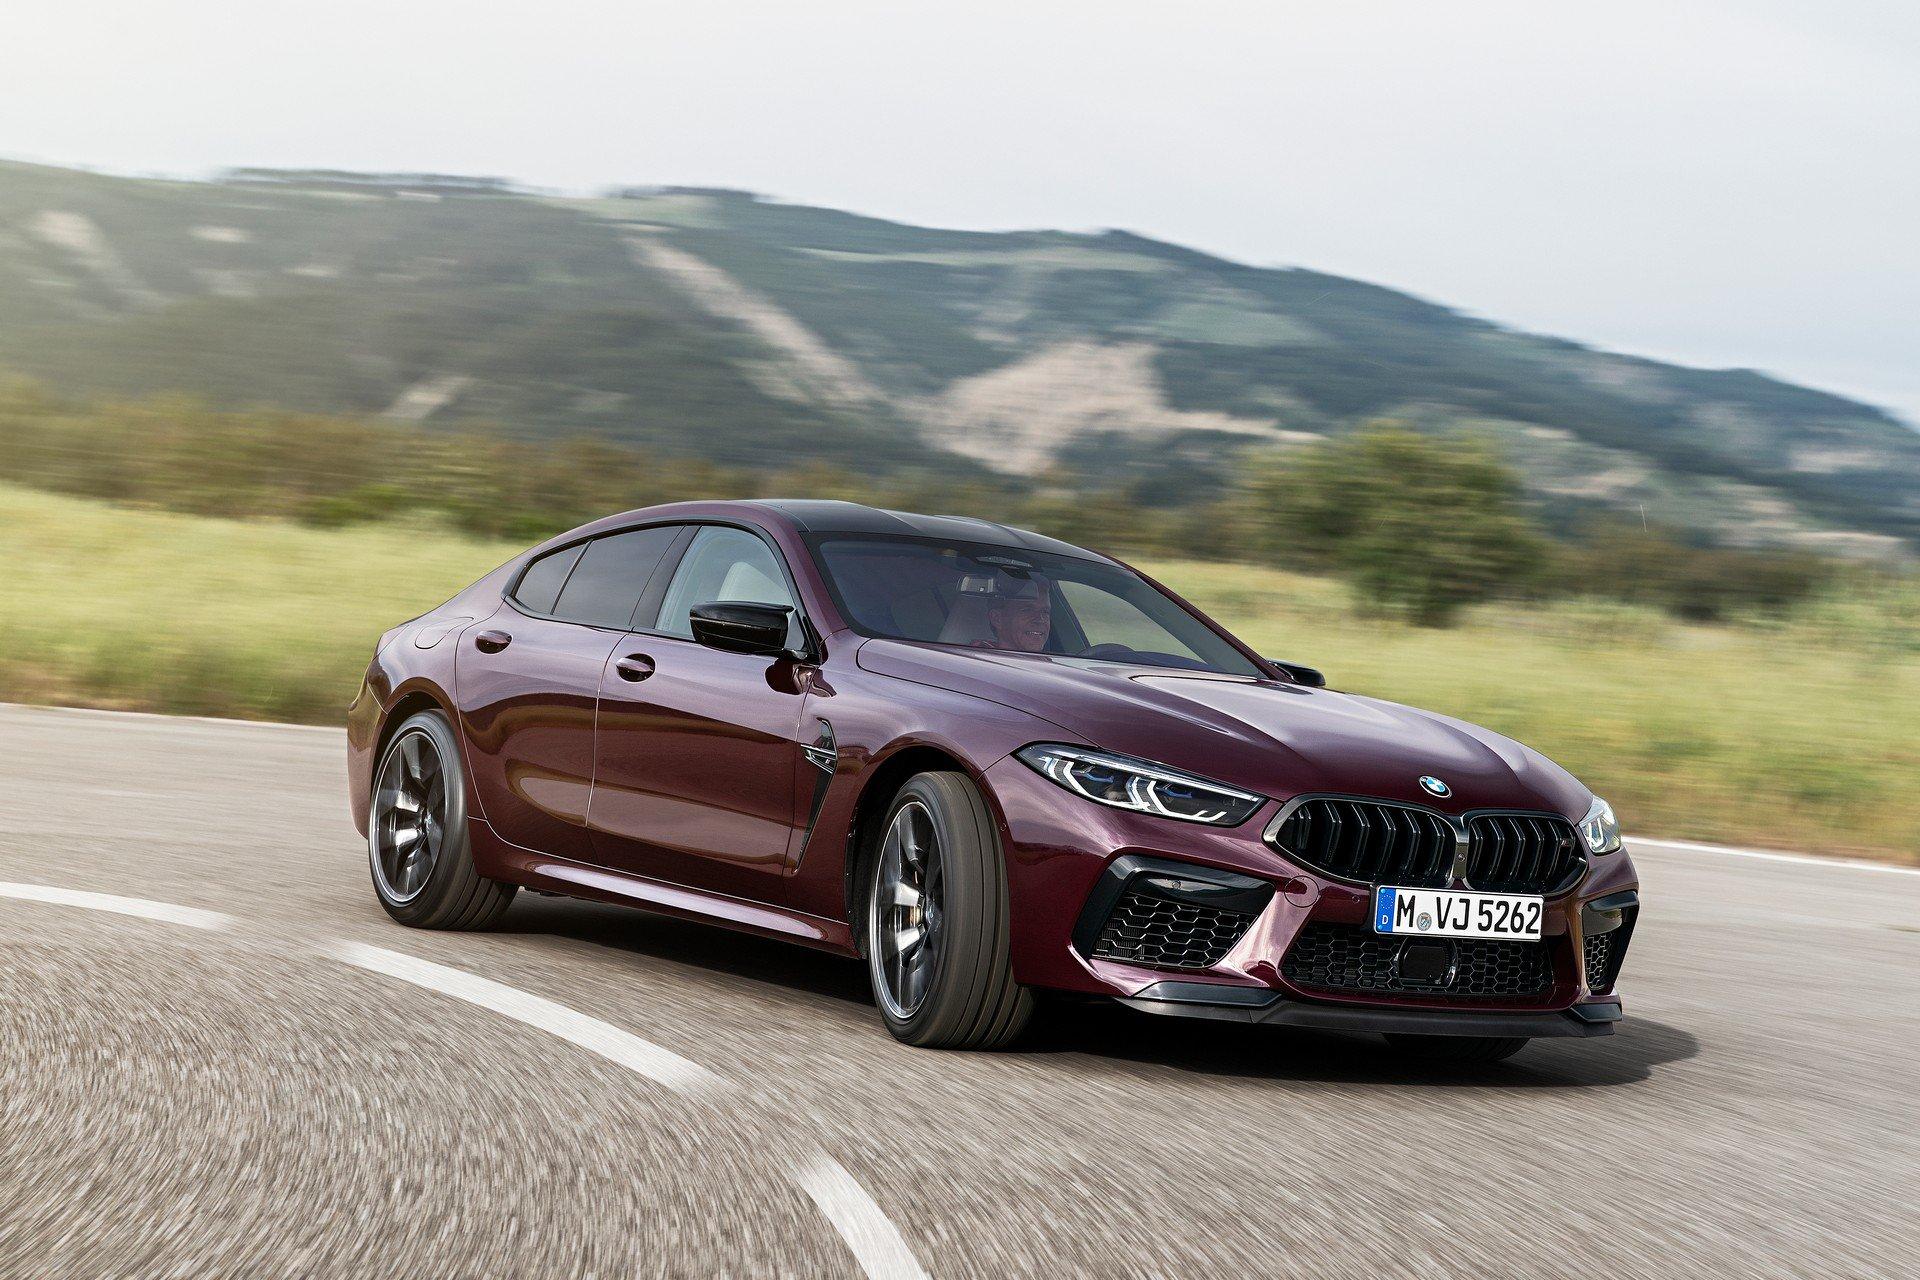 2020-bmw-m8-gran-coupe-1.jpg